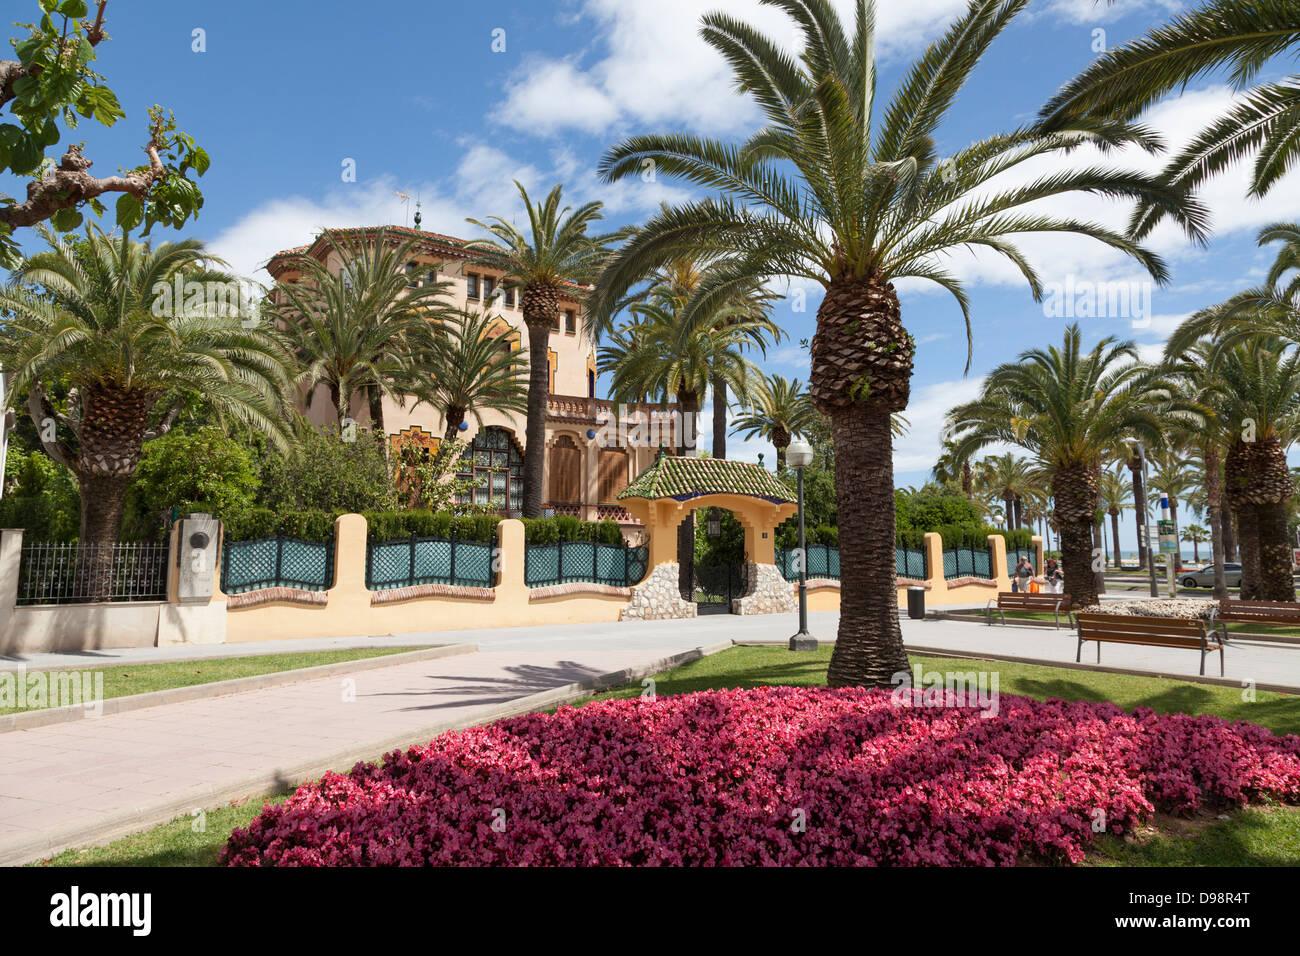 Xalet Bonet tarda architettura modernista a Salou Spagna costruito da Ciriac Bonet. Immagini Stock